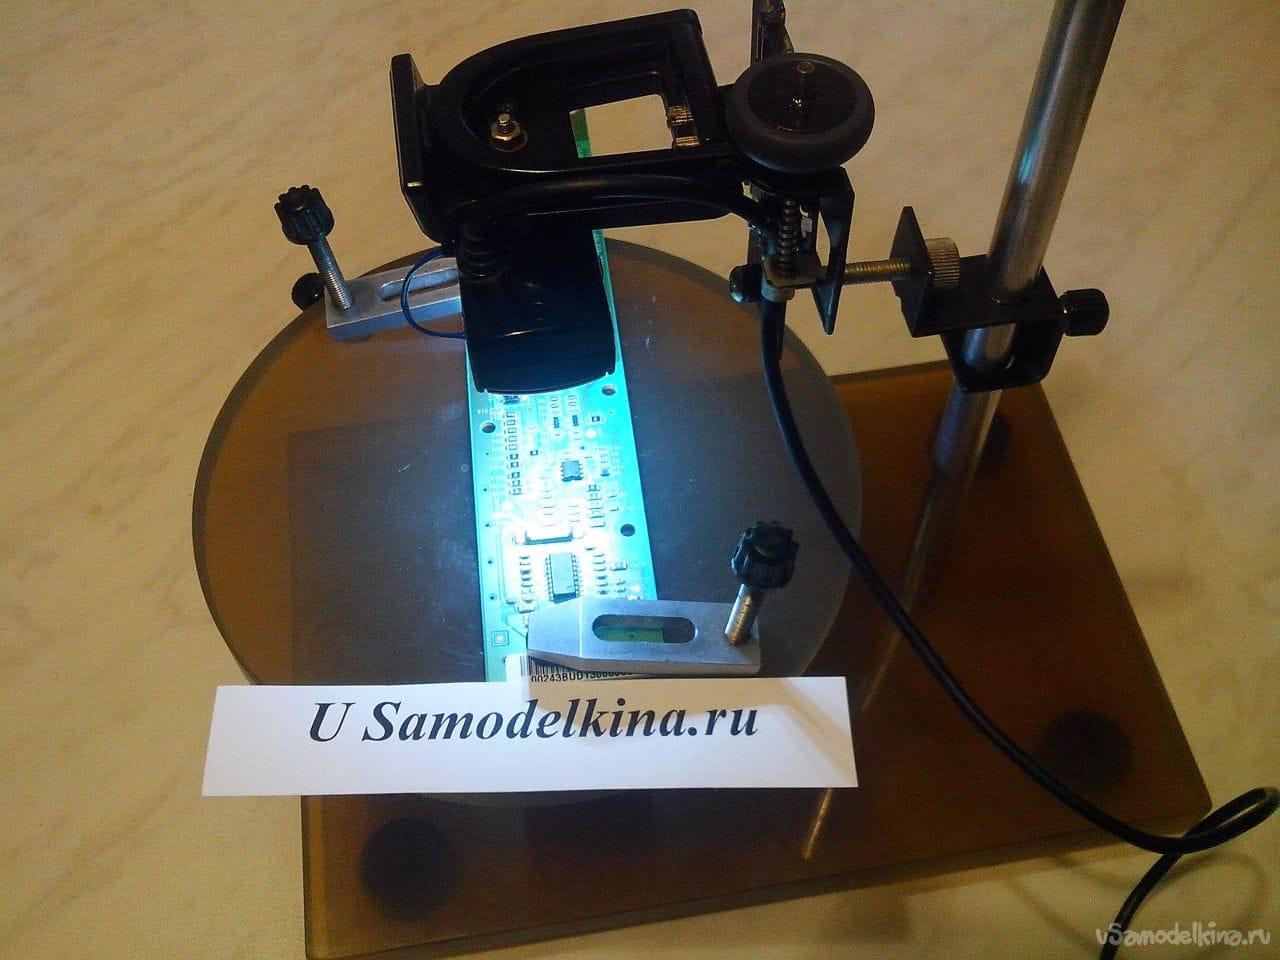 Микроскоп из цифрового фотоаппарата своими руками